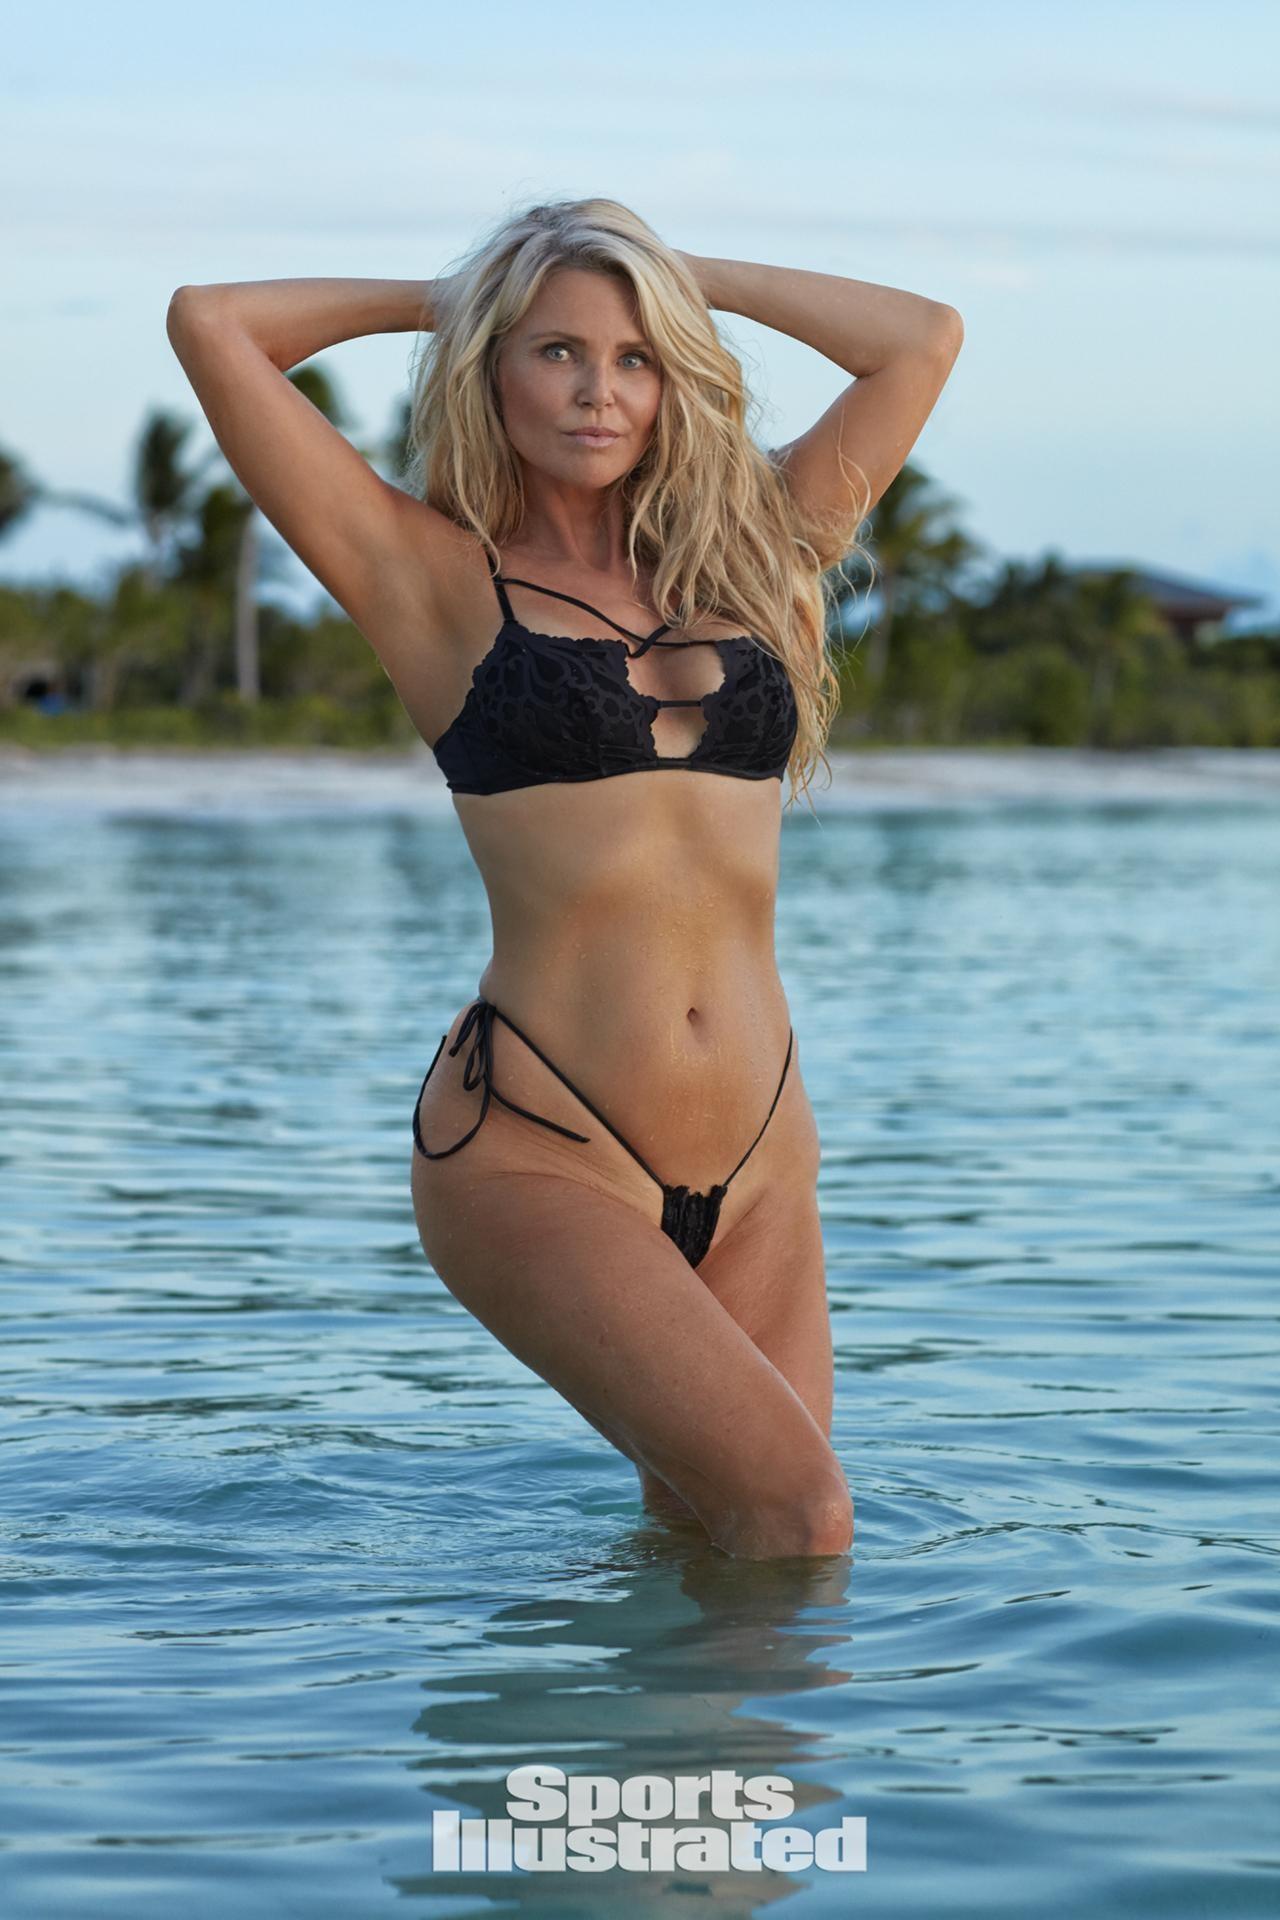 Christy brinkley fotos desnudas